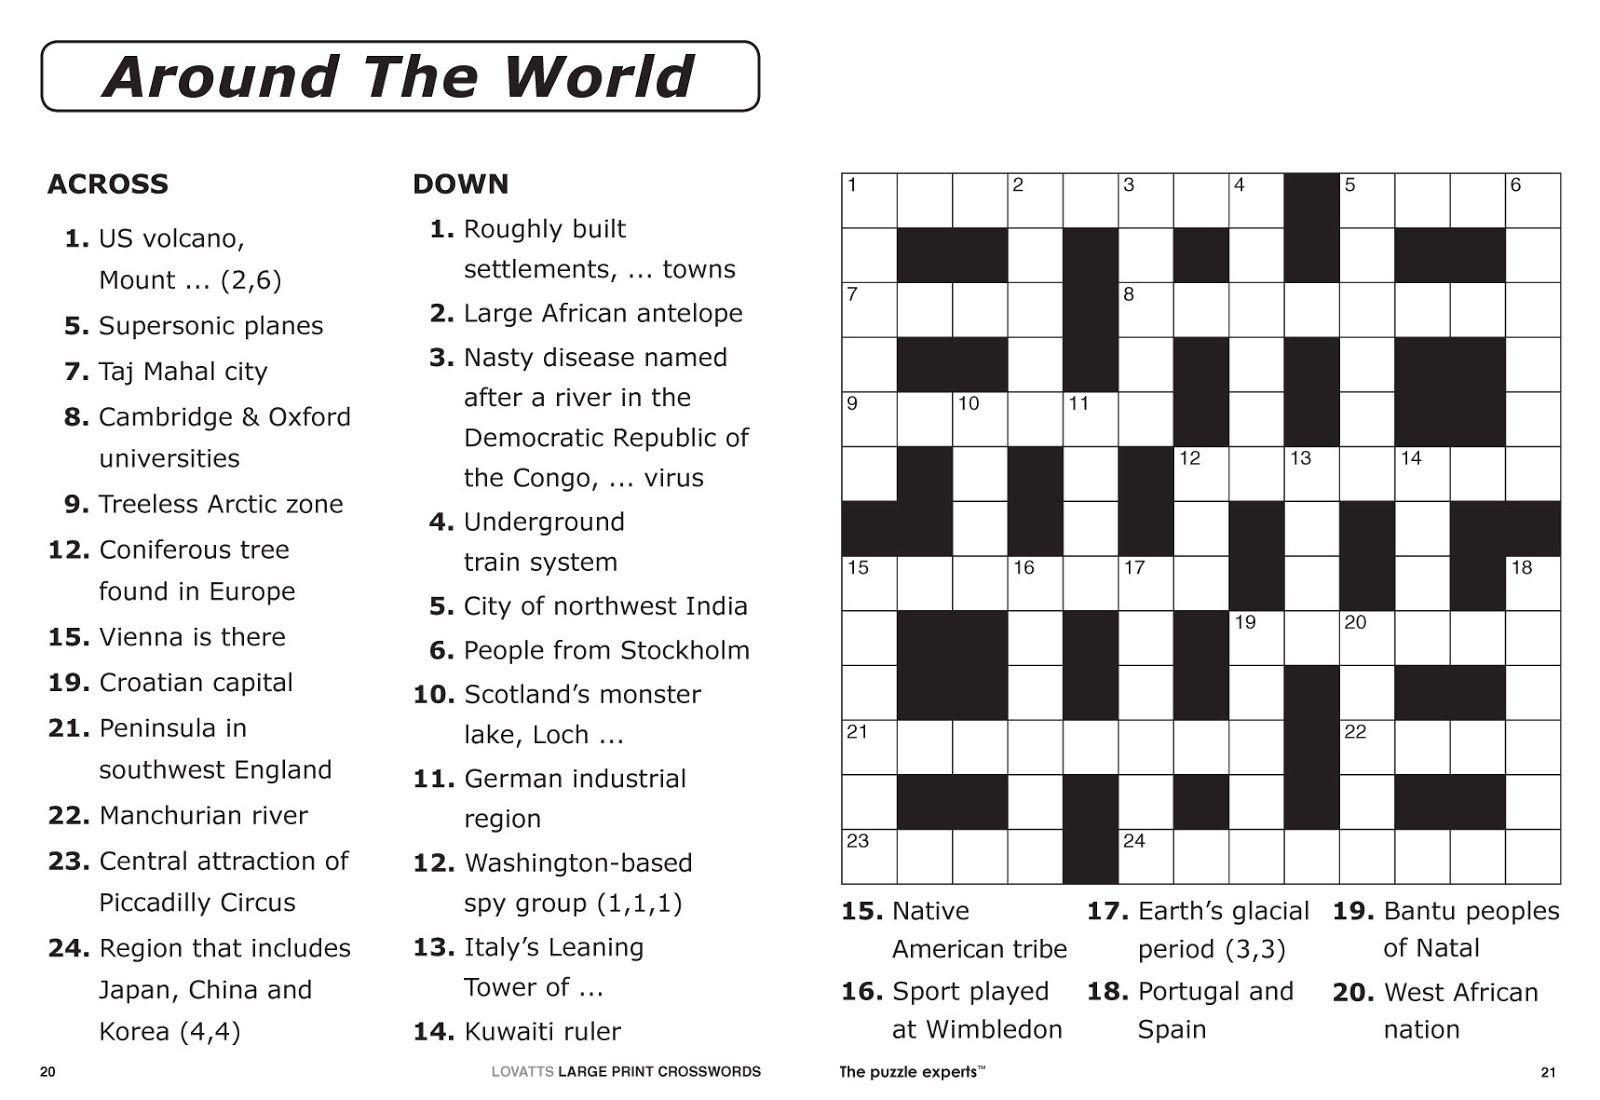 Free Printable Large Print Crossword Puzzles | M3U8 - Free Printable Sports Crossword Puzzles